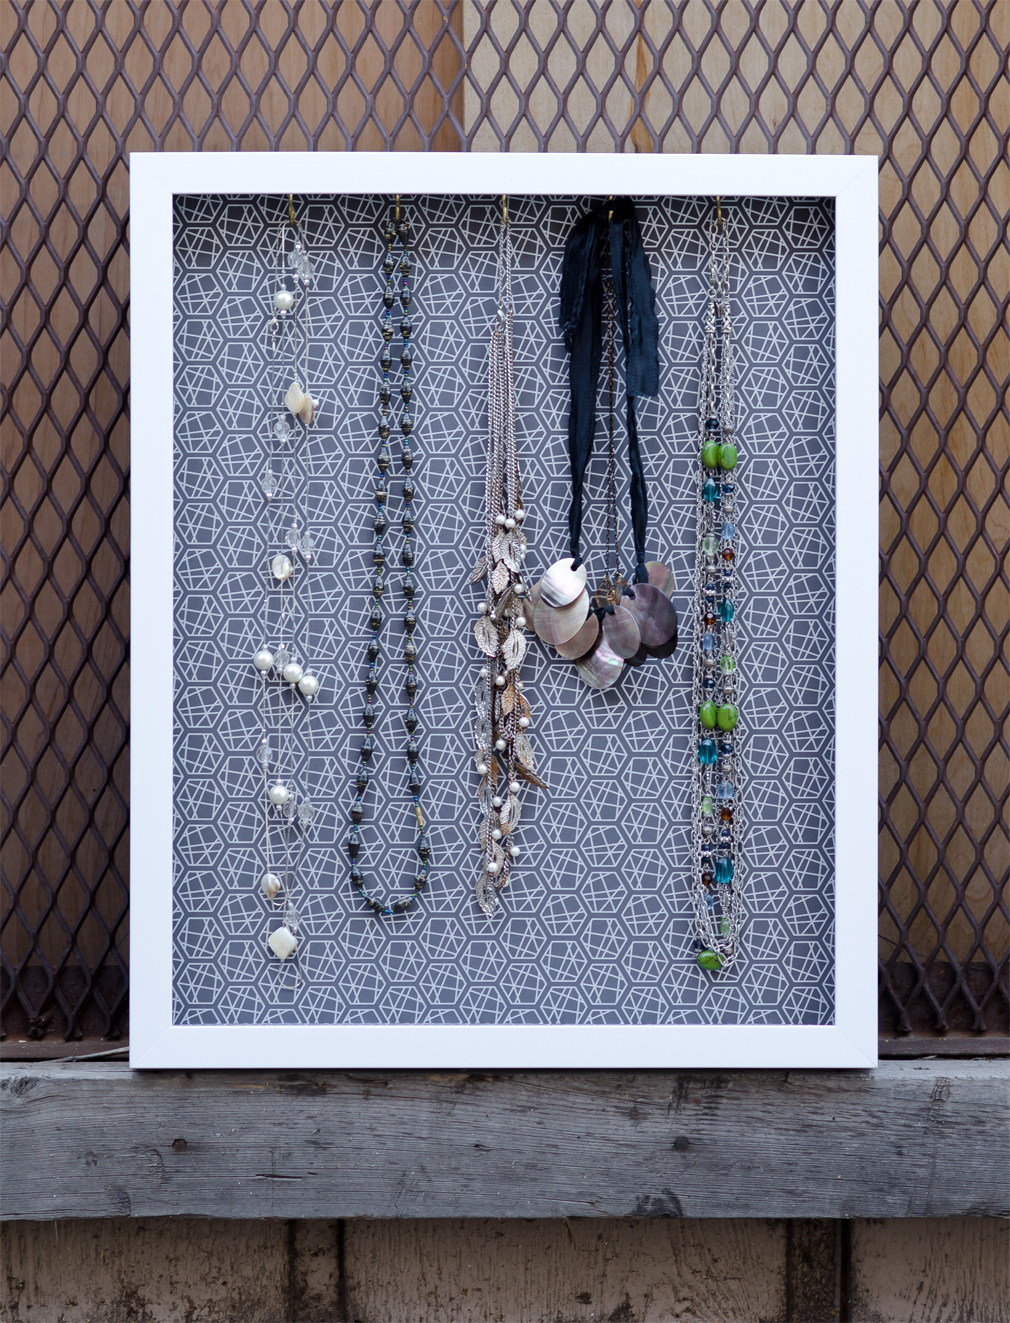 The perfect gift anthology fine art denver custom framing jewelrybox solutioingenieria Gallery